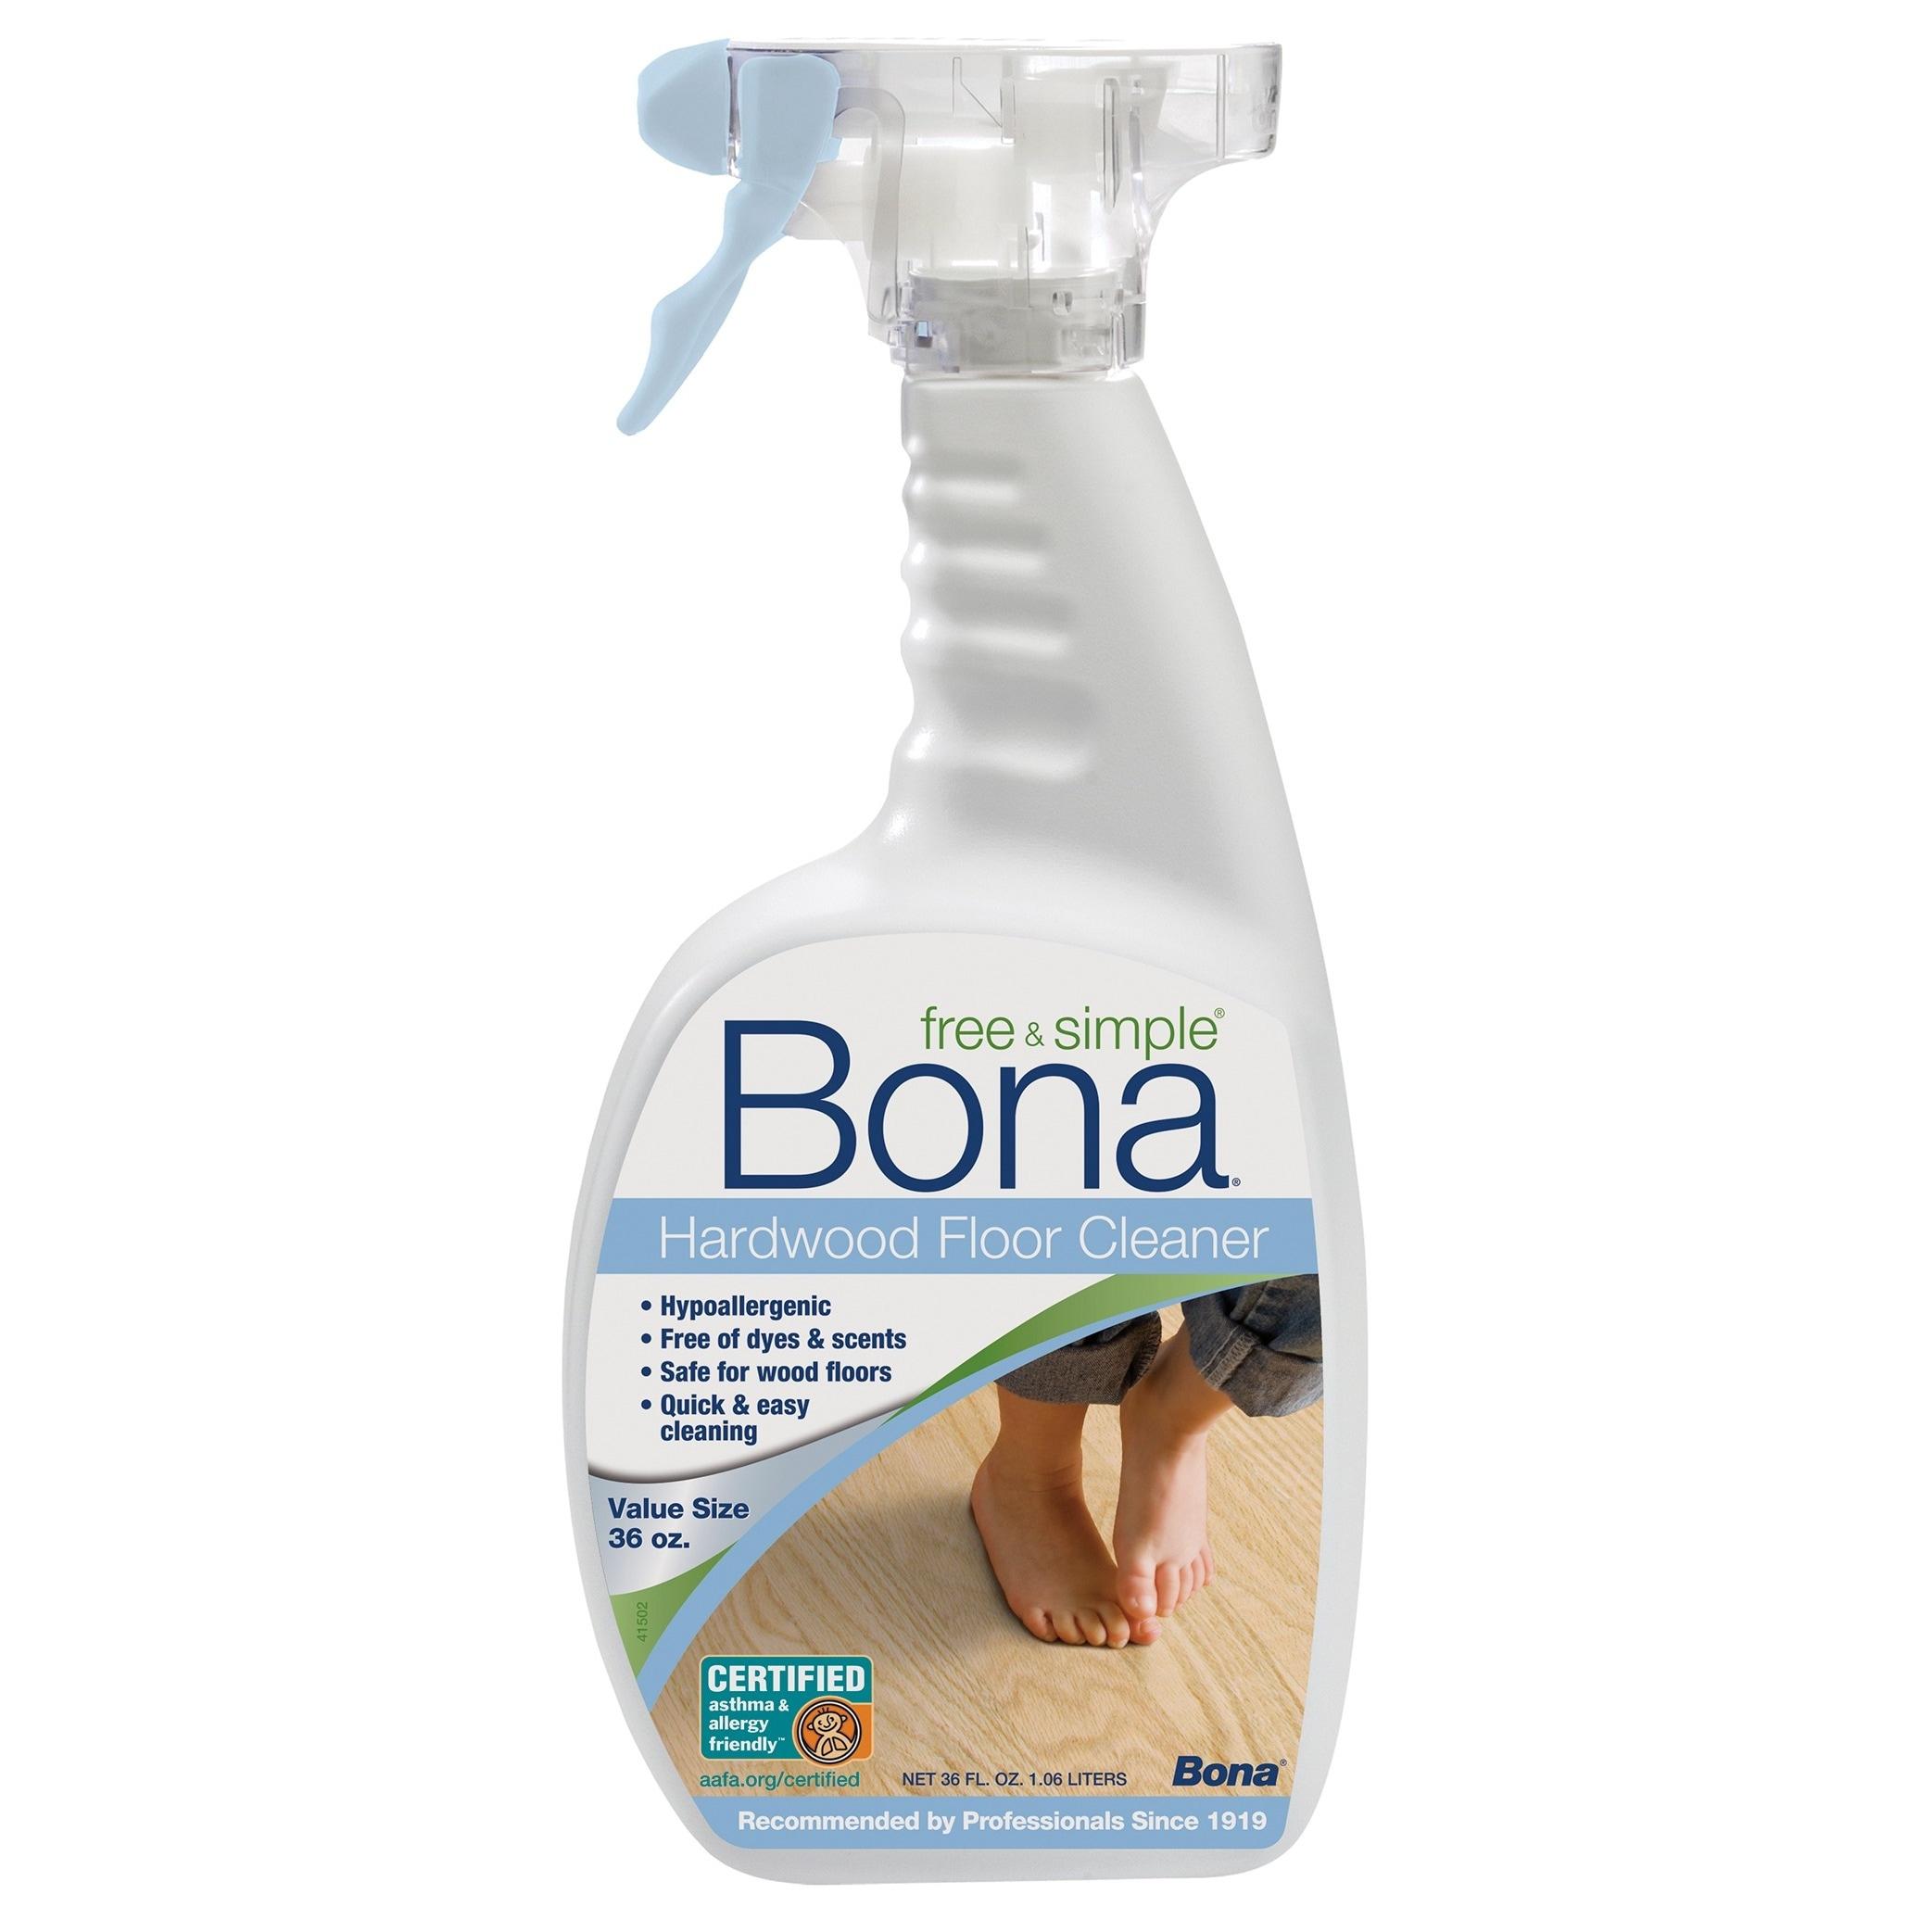 Bona Hardwood Floor Cleaner 36 oz. Spray